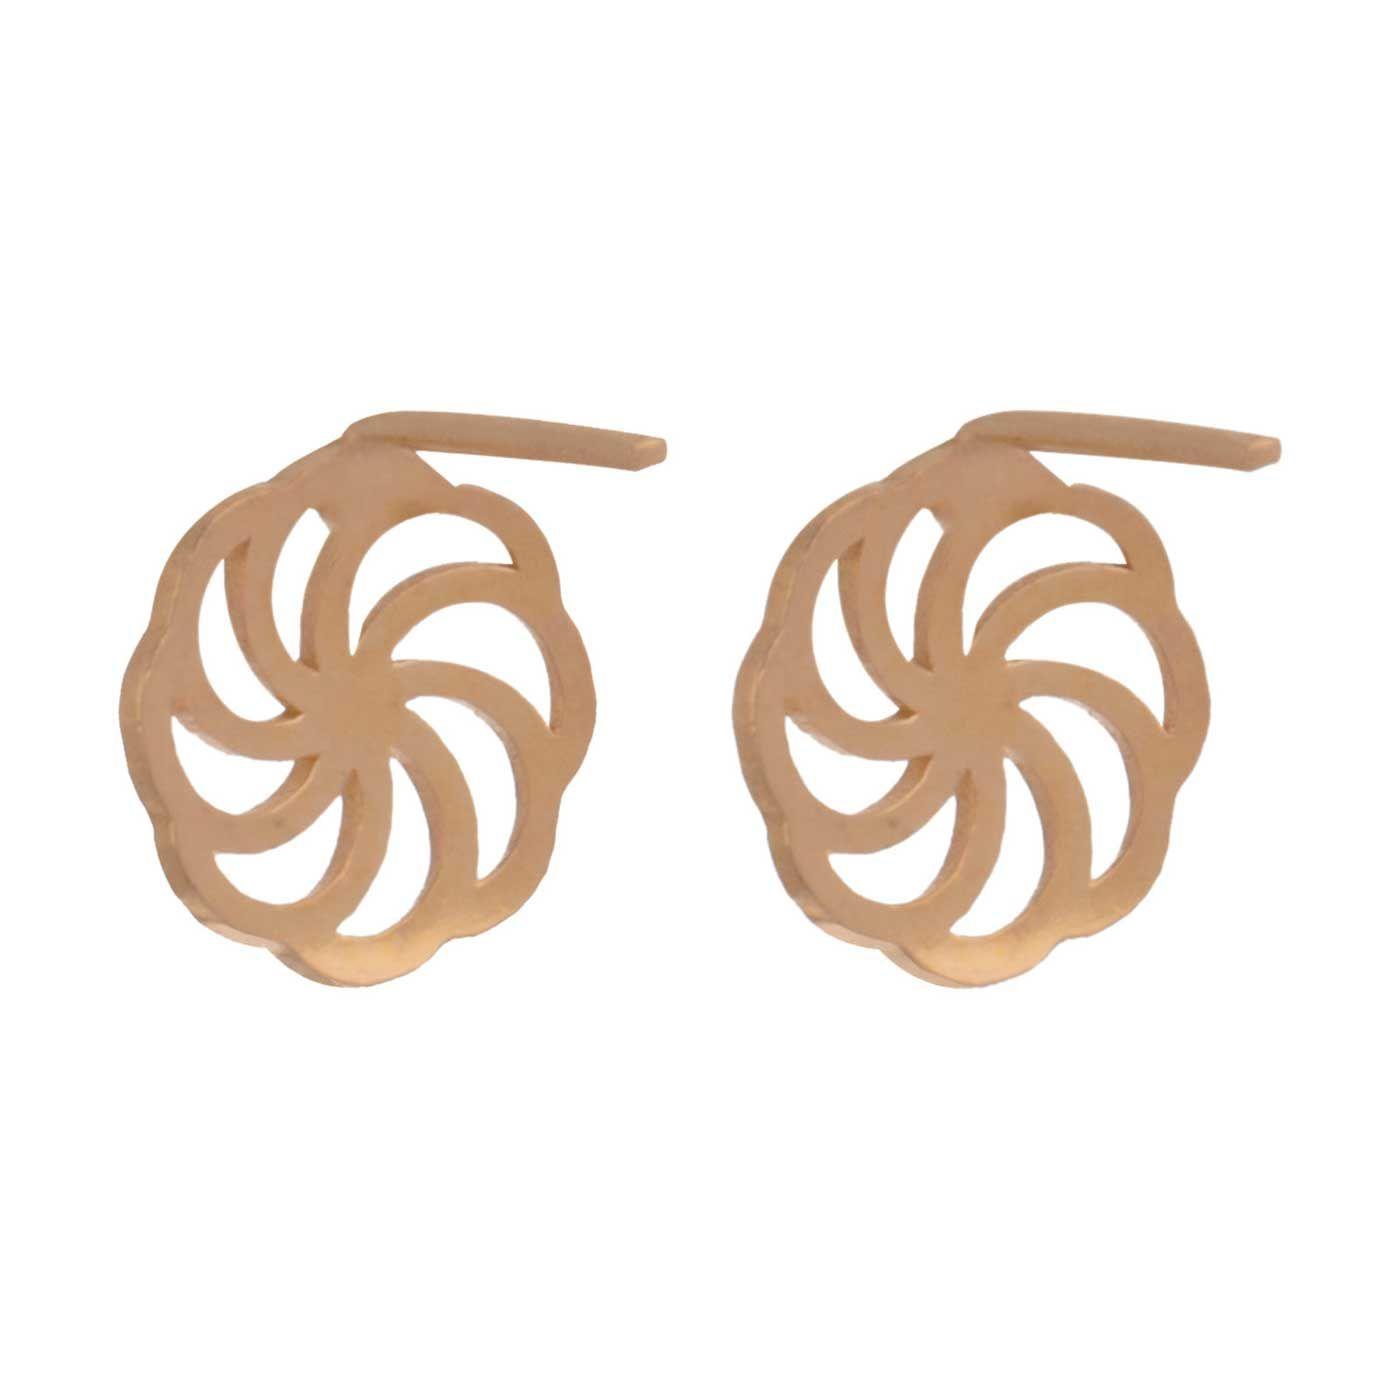 گوشواره طلا 18 عیار زنانه کانیار گالری کد GOA104 -  - 5